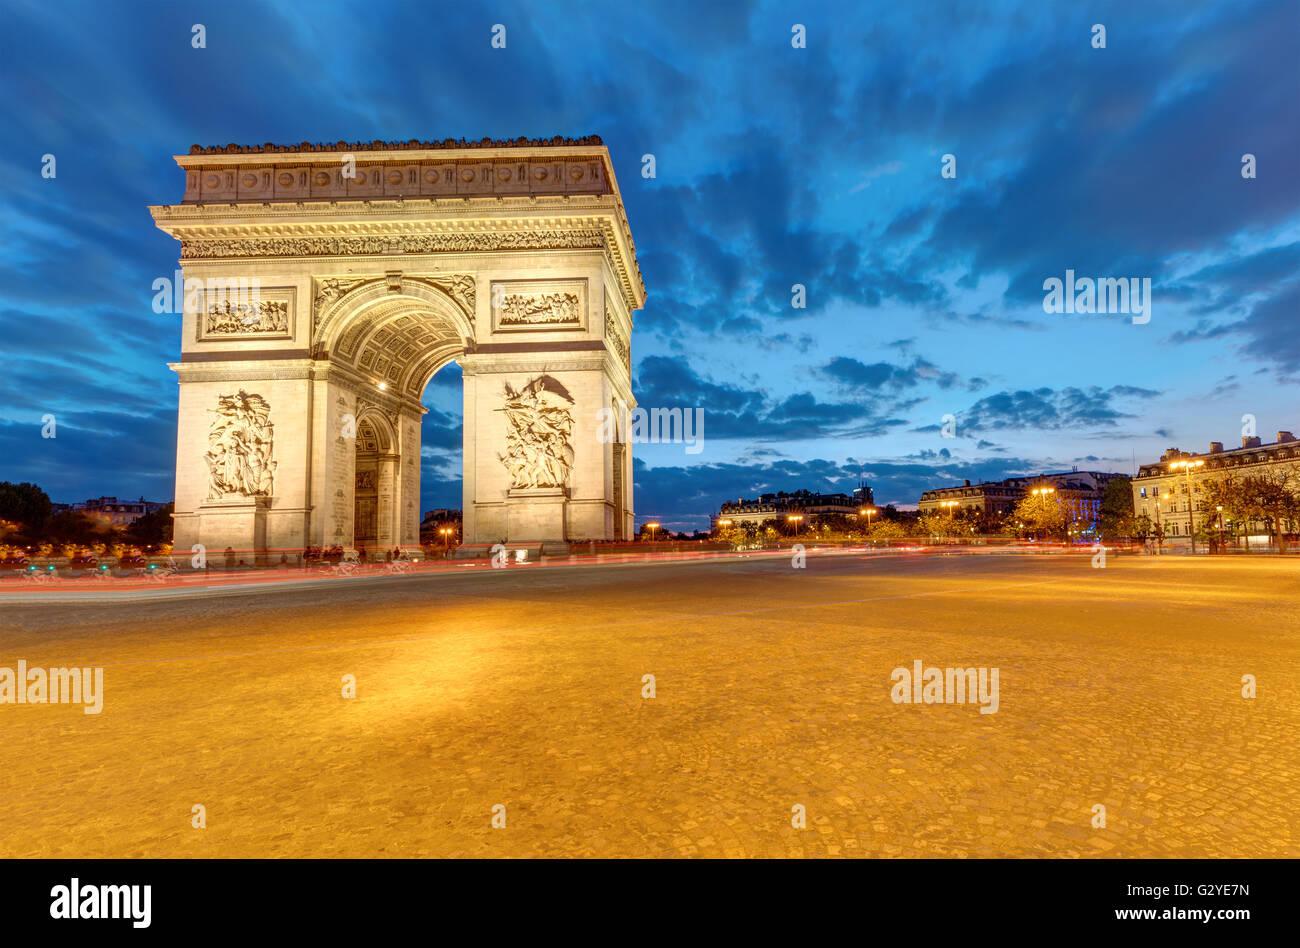 The famous Arc de Triomphe in Paris at dawn - Stock Image